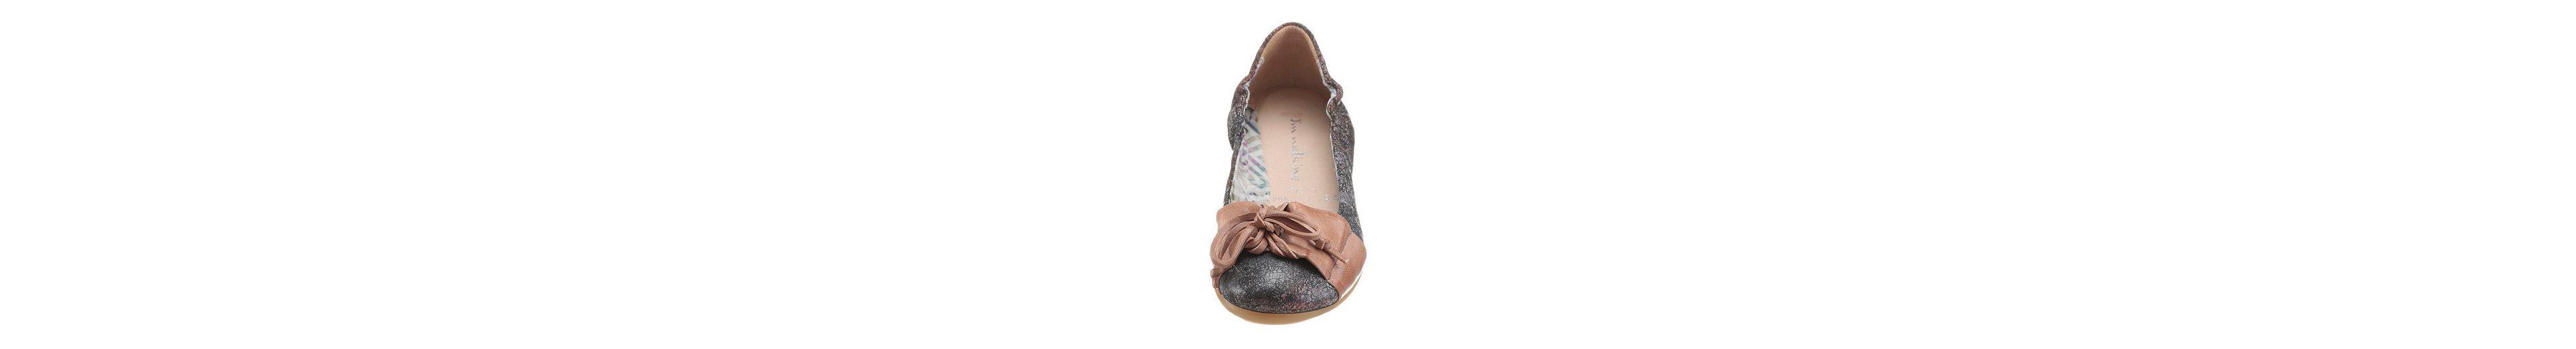 Ballerina Ballerina Optik Used walking I'm mit mit walking I'm Used HUwOwq